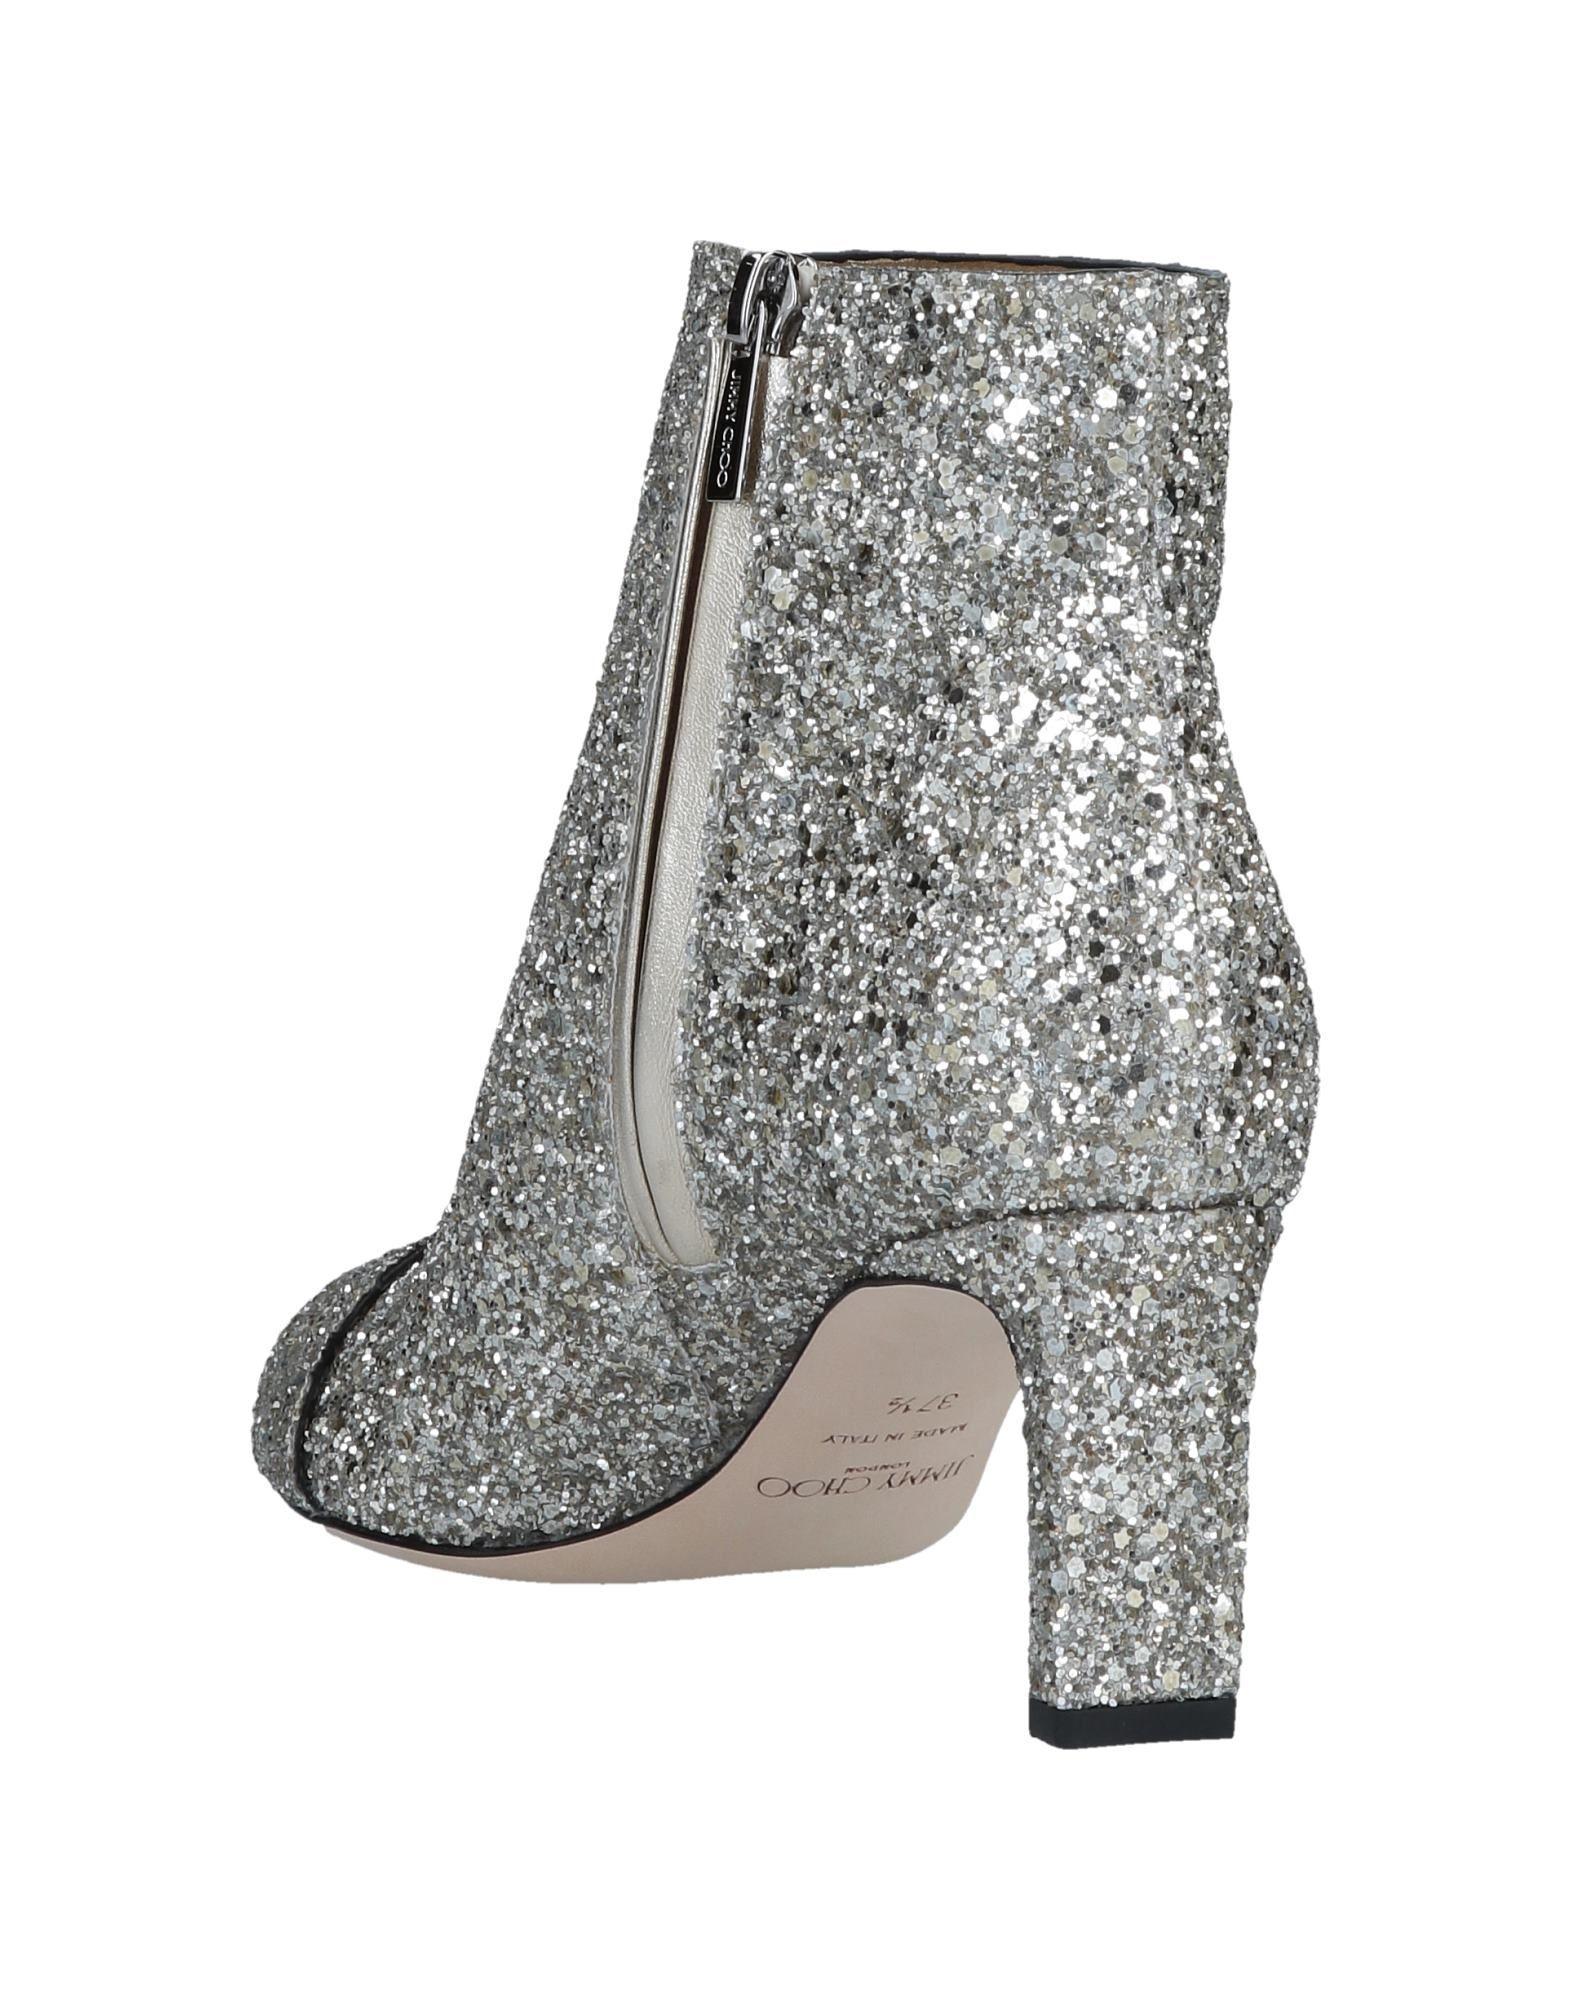 0adb2b361f4 Lyst - Jimmy Choo Boots Hanover 65 Fabric Glitter Silver Buckle in Gray -  Save 60%